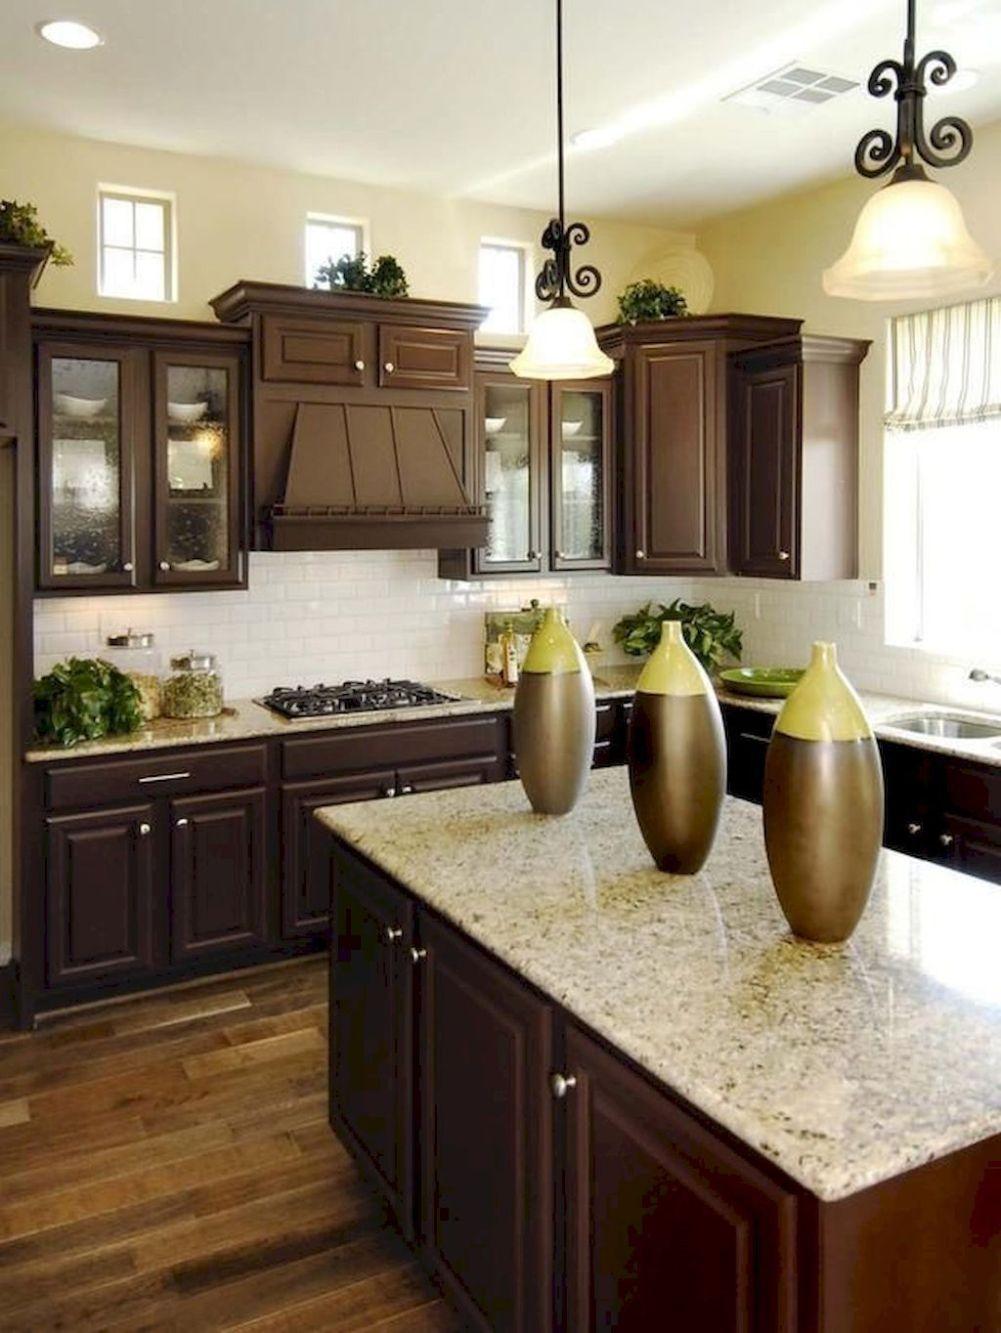 57 gorgeous kitchen backsplash décor ideas with dark cabinets kitchen backsplash designs on kitchen ideas with dark cabinets id=25409